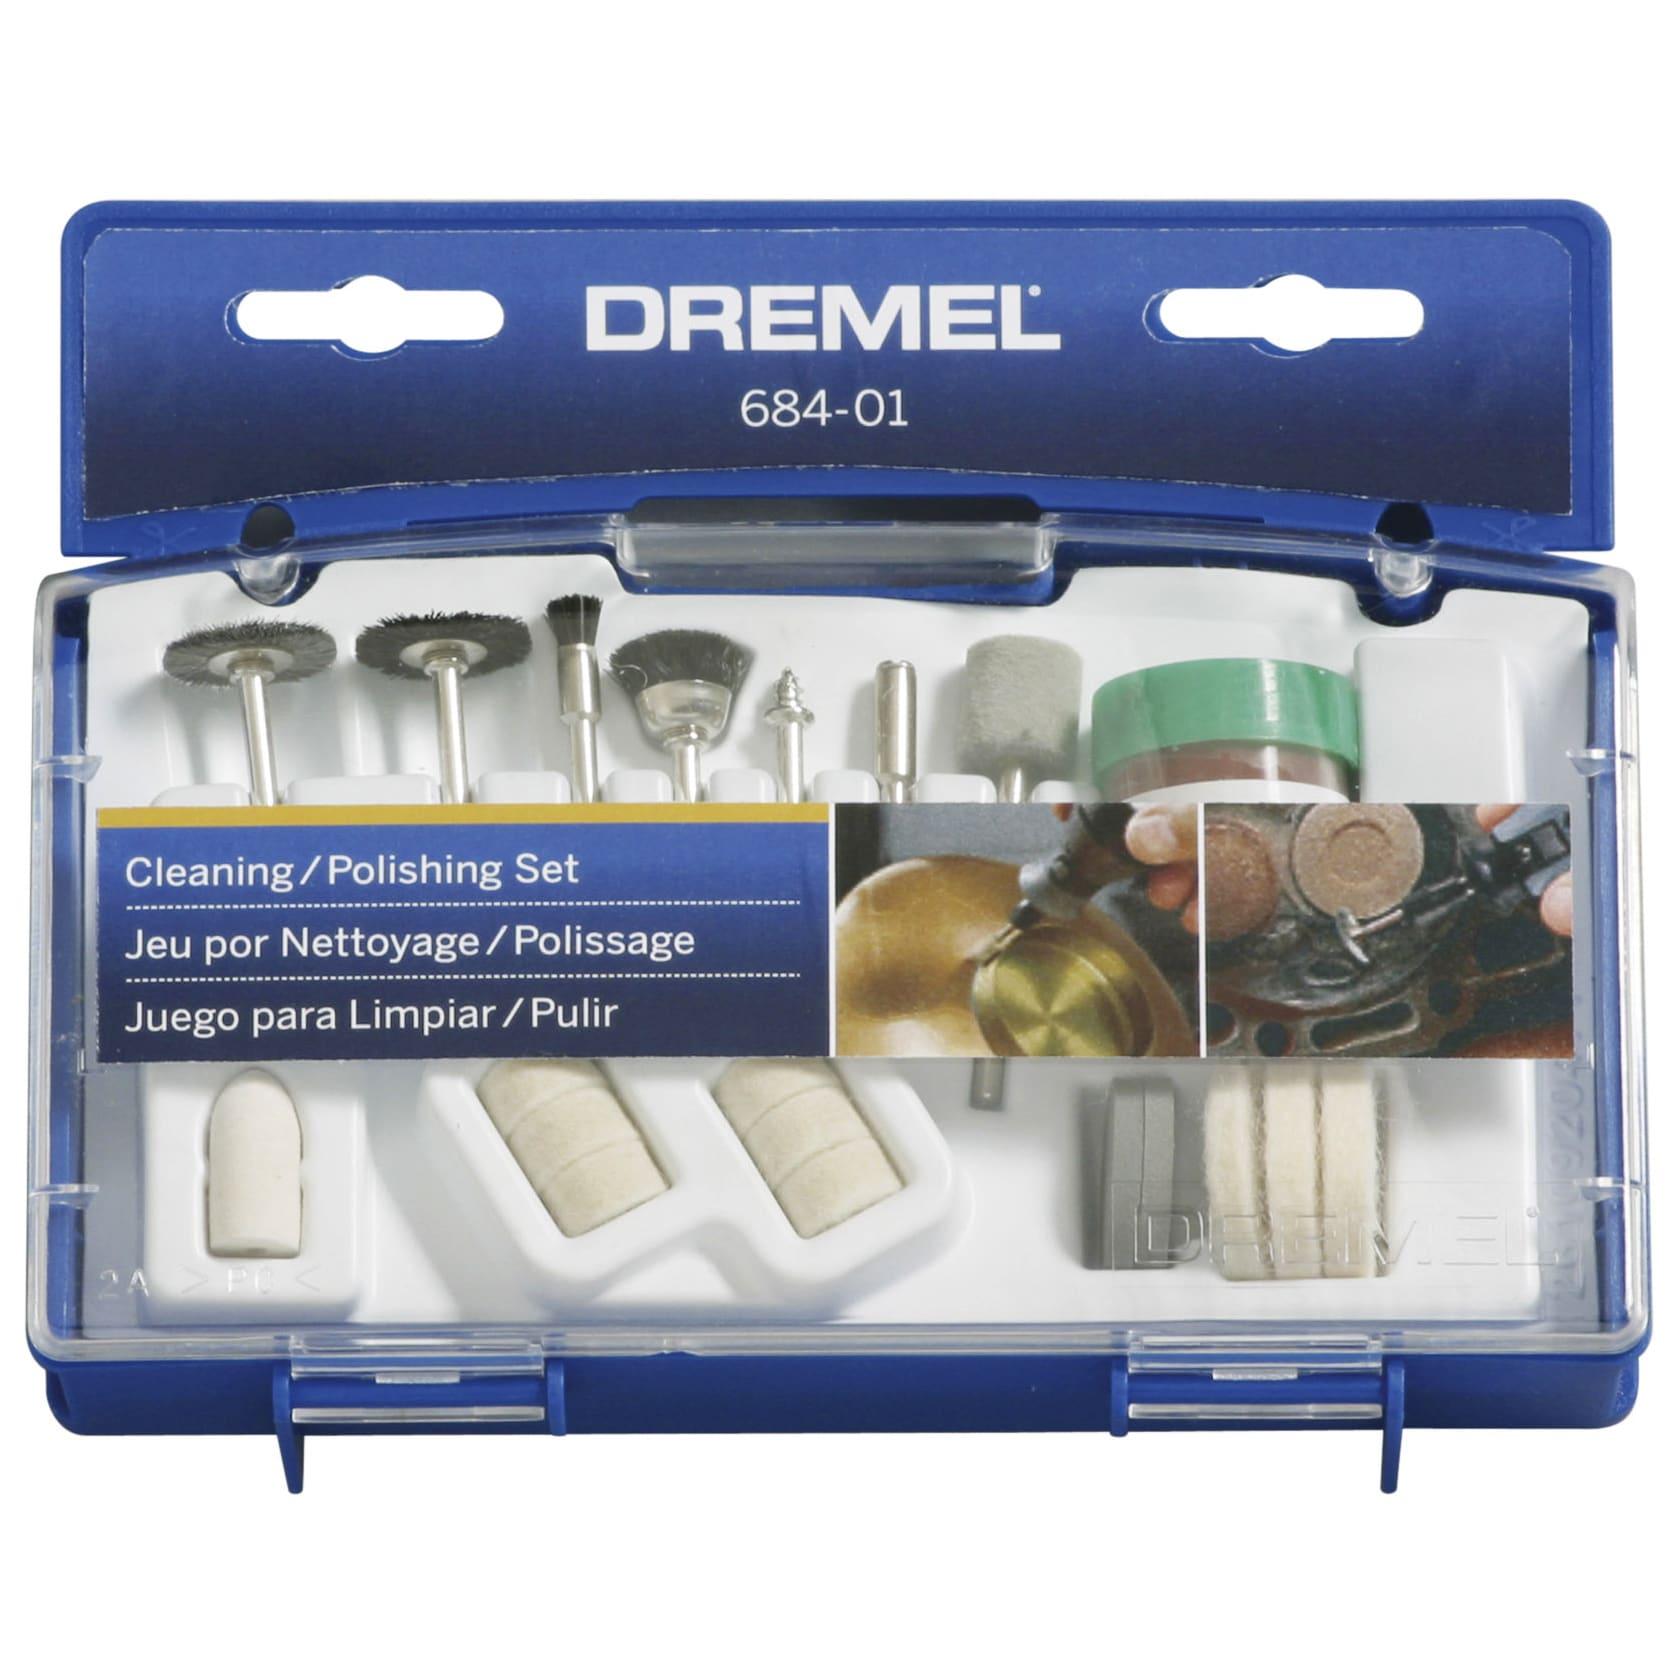 Dremel 684-01 20-piece Set Cleaning and Polishing Bits (P...